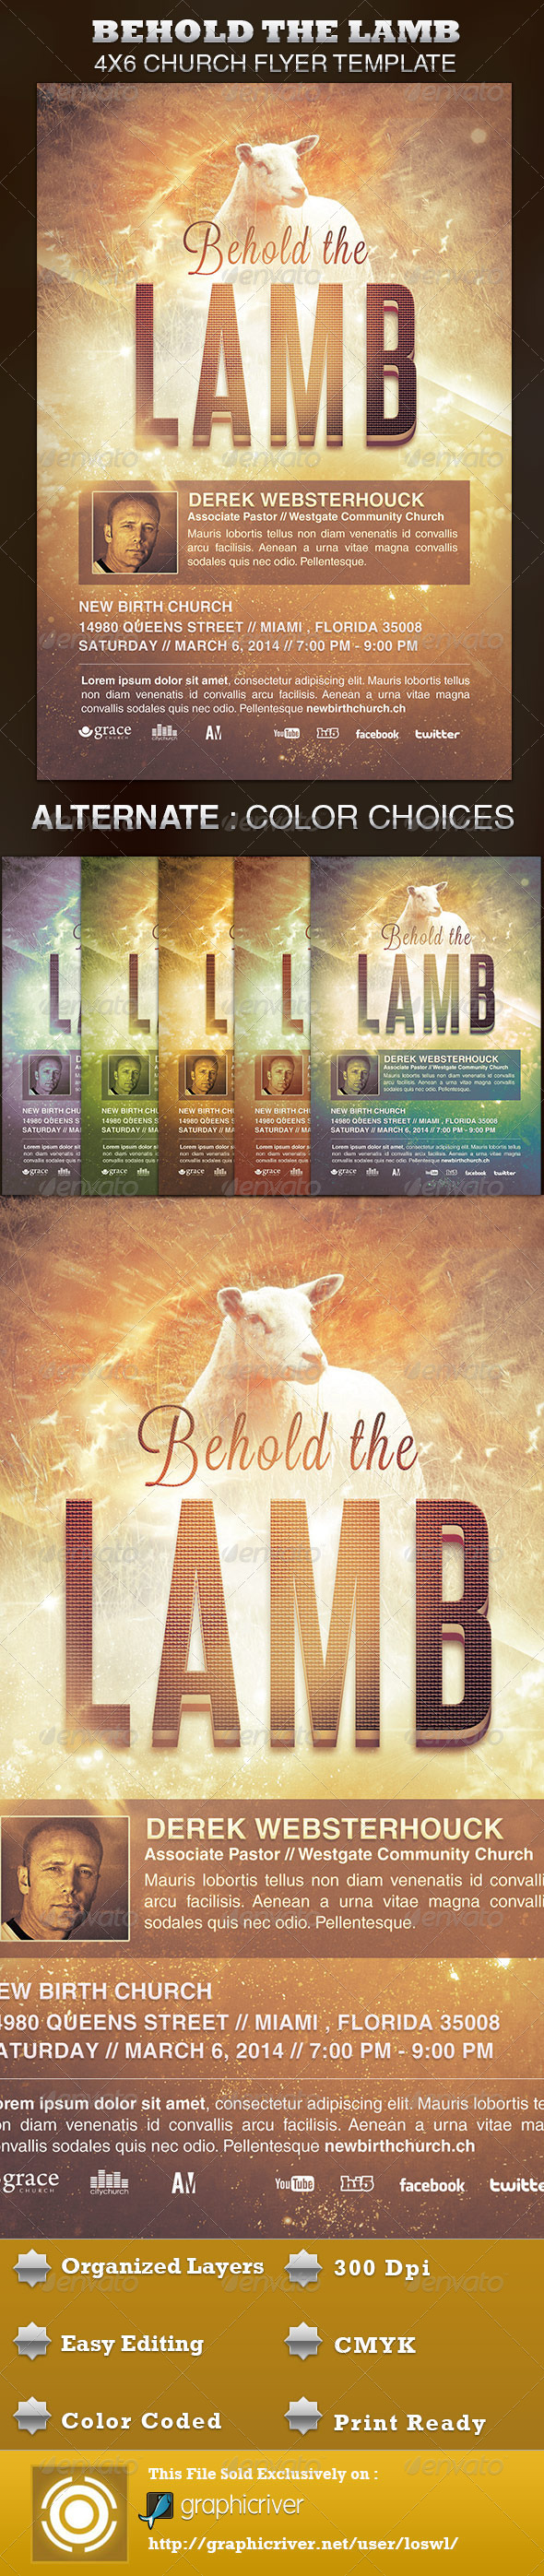 graphicriver quest church concert flyer template 4443421 template 4363003 graphicriver behold the lamb church flyer